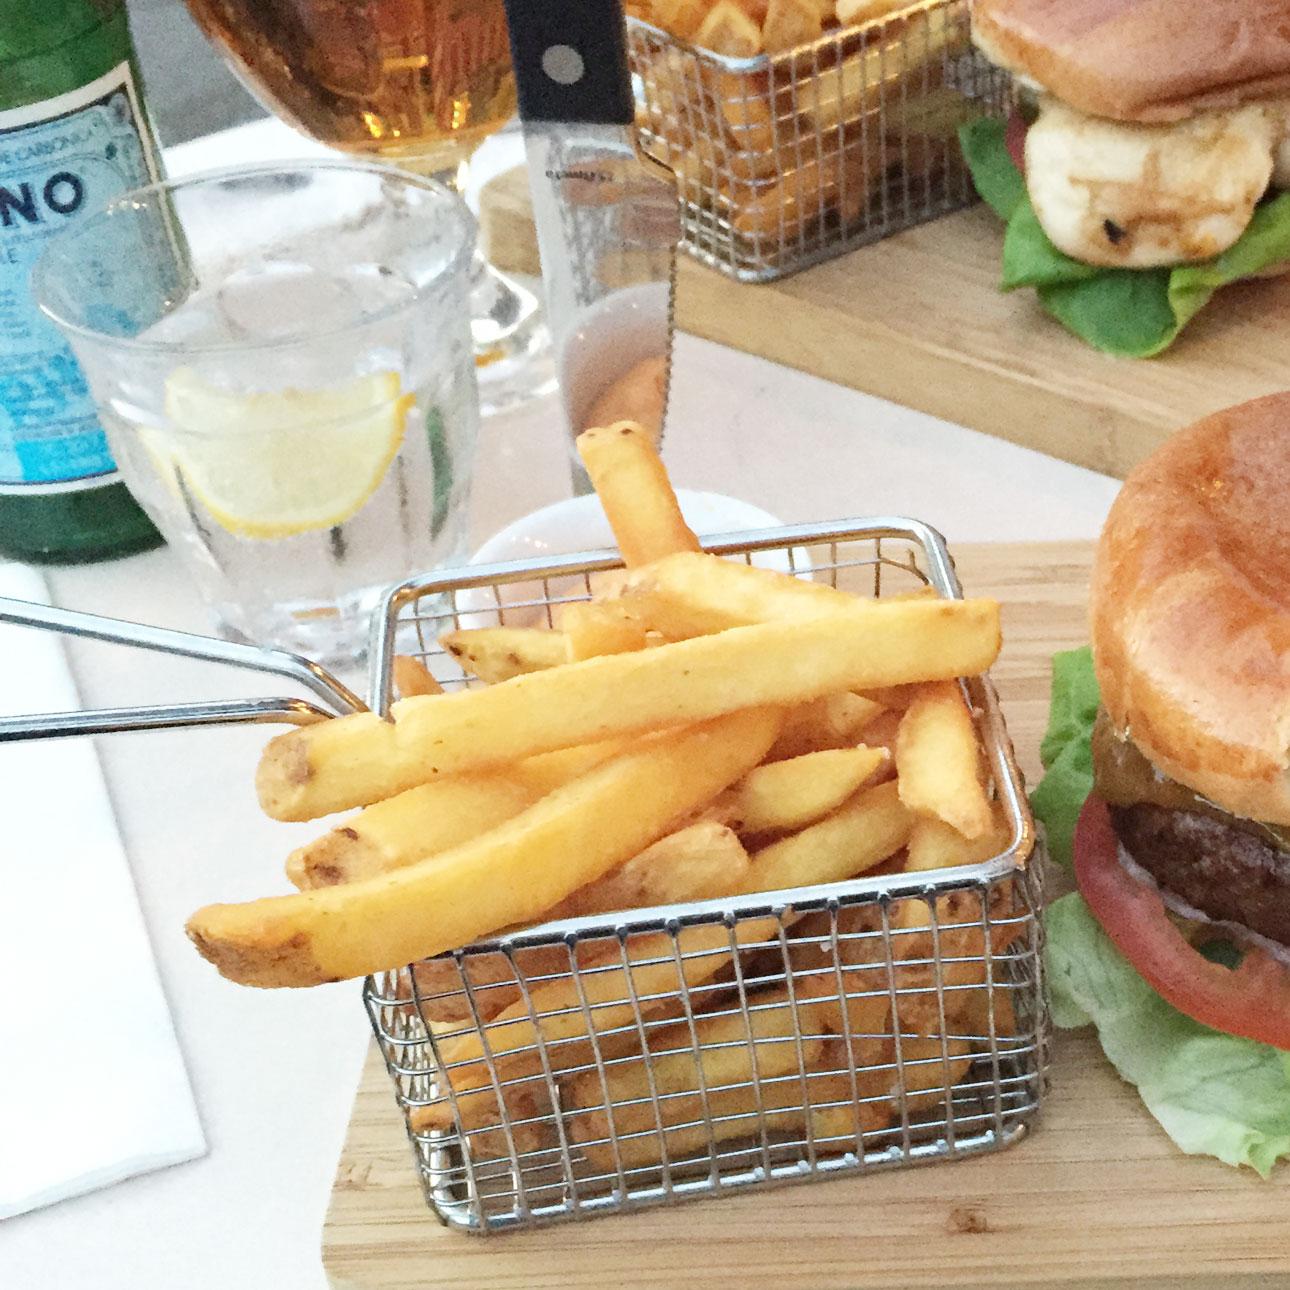 Kopenhagen hotspots Cafe Alma burgers kip